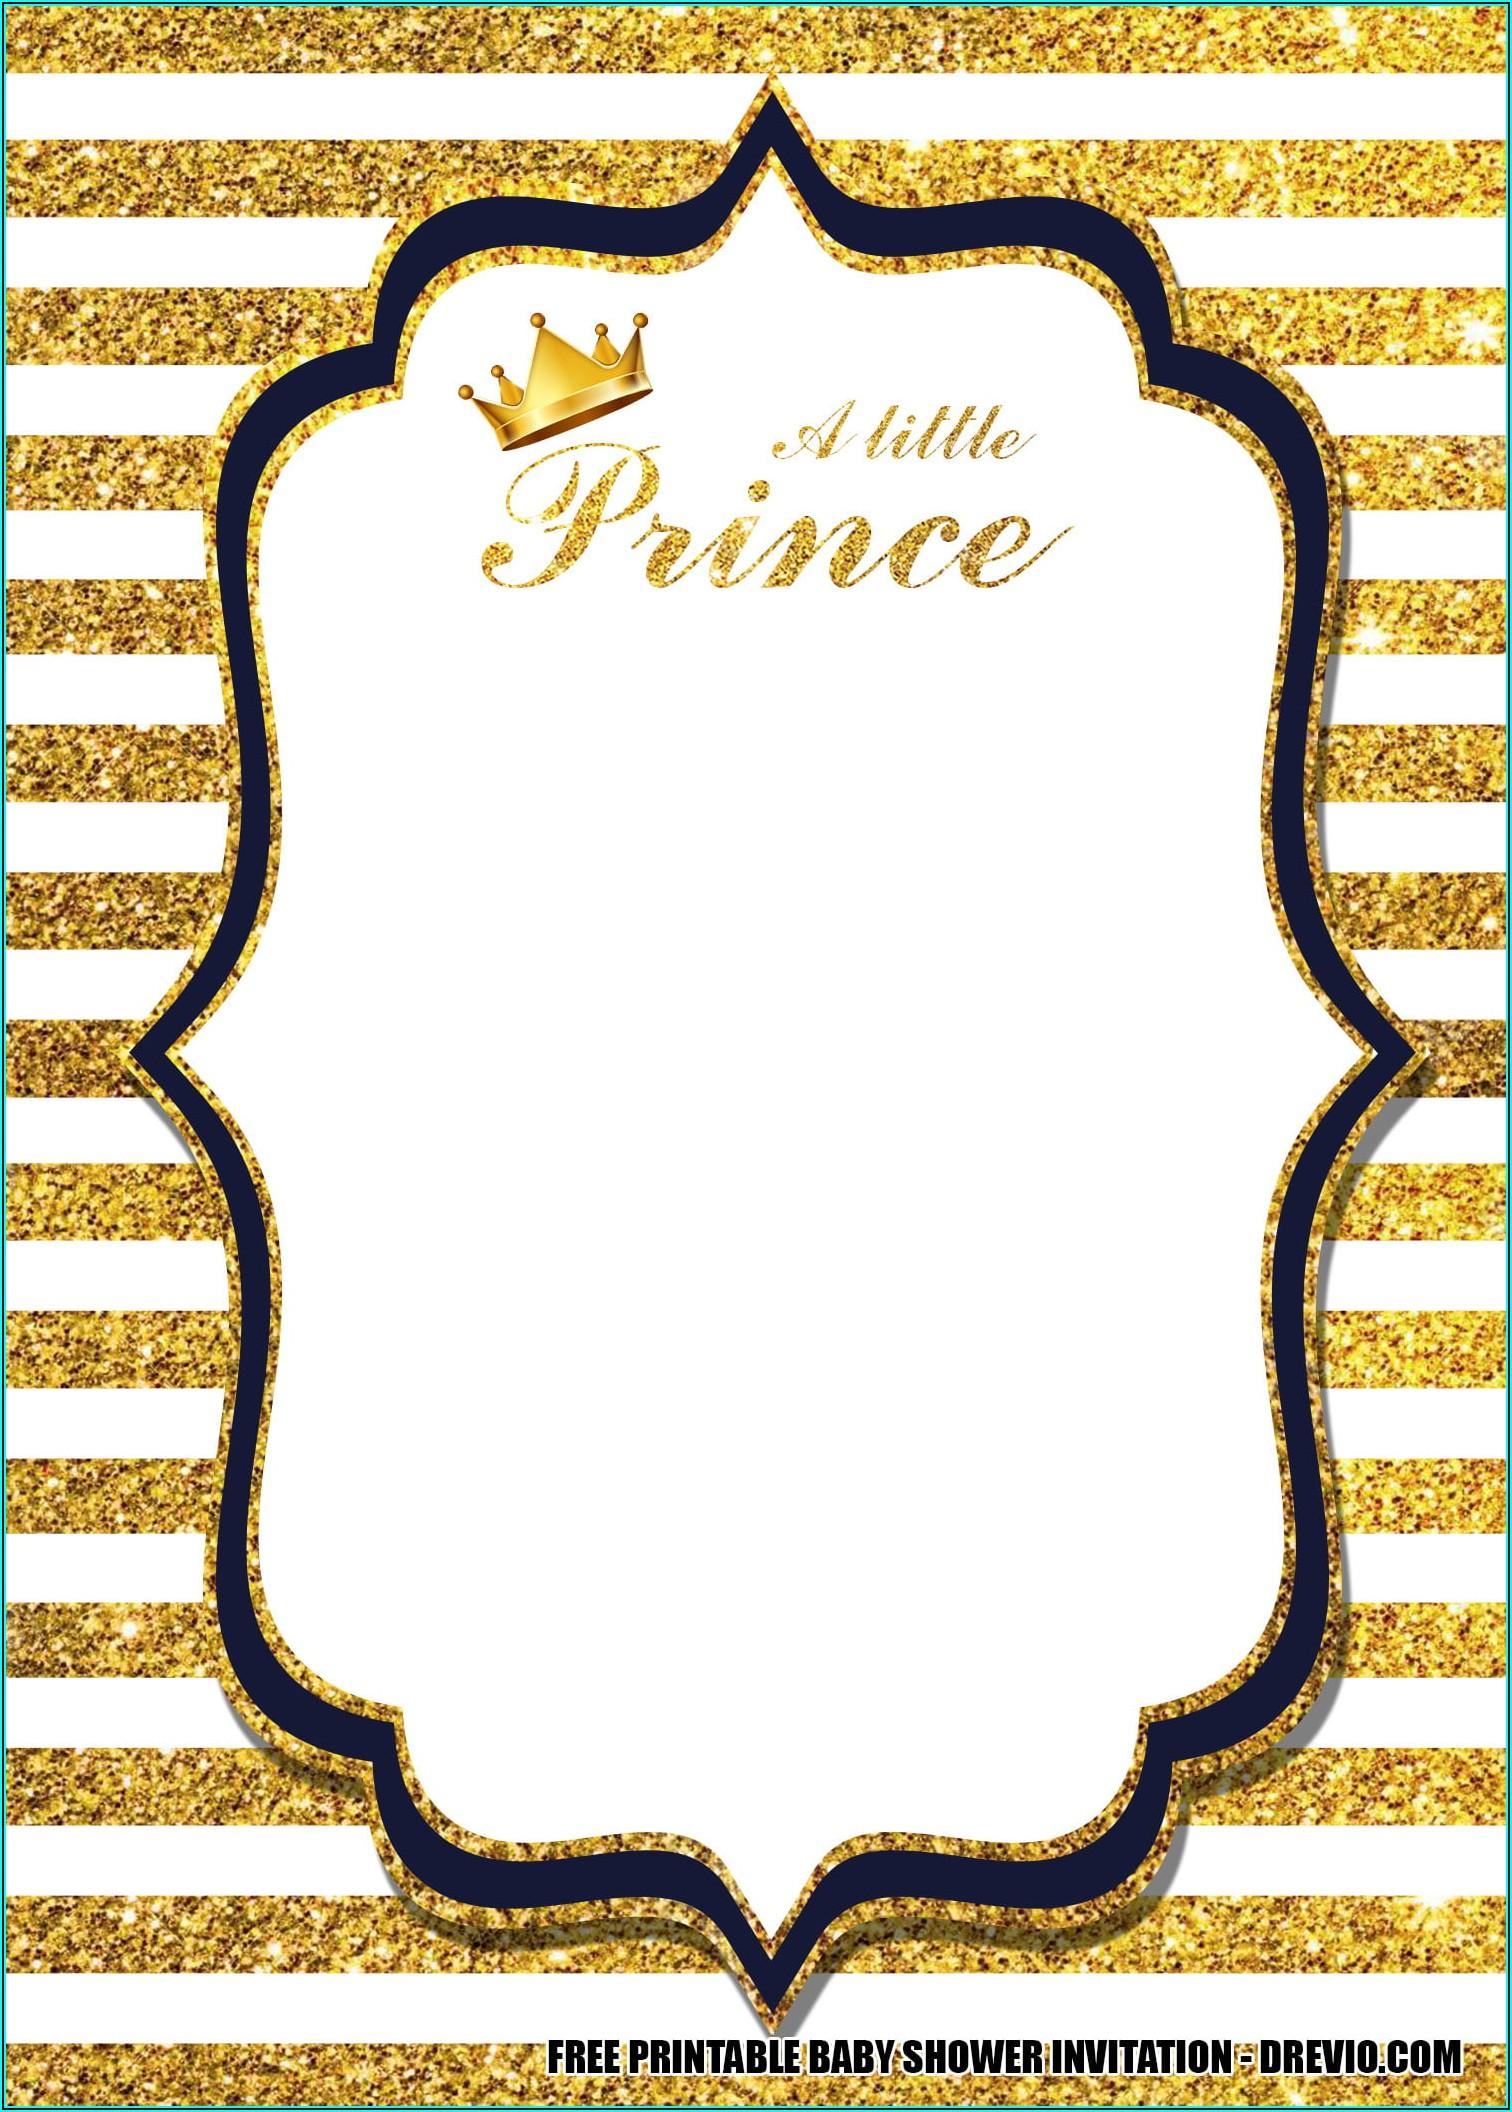 Downloadable Royal Prince Birthday Invitation Template Free